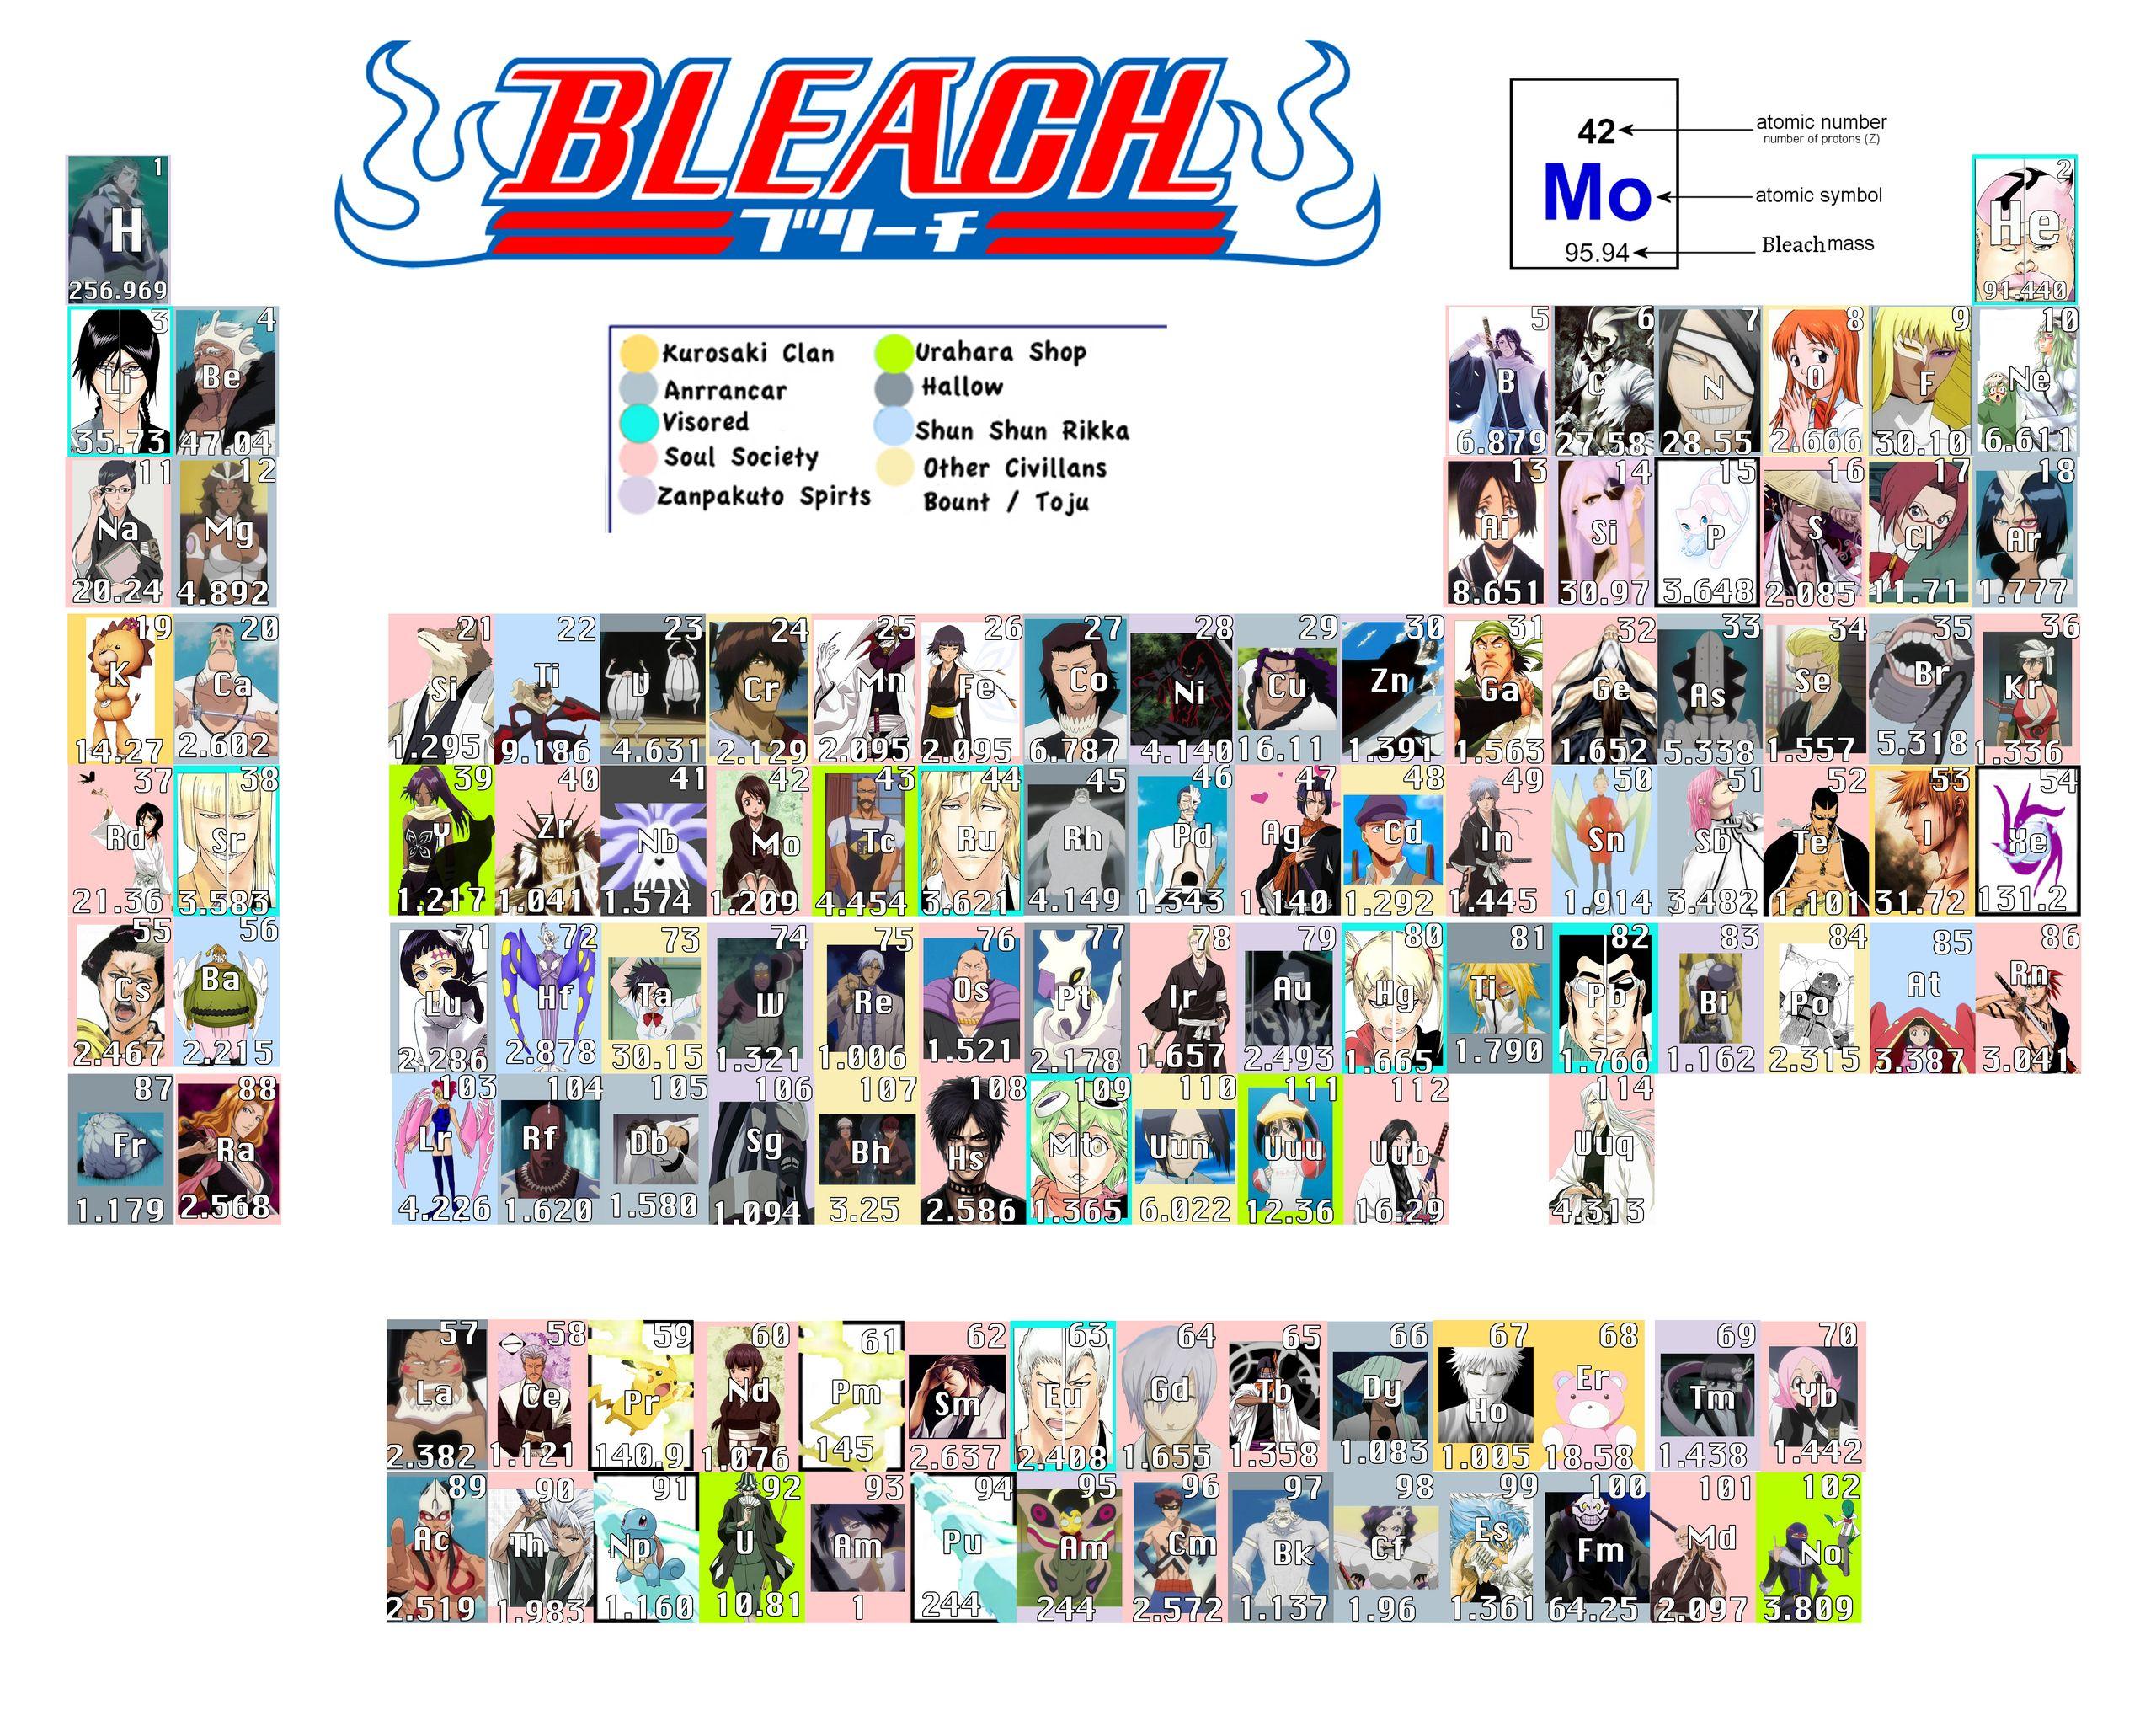 Anime periodic elements bleach periodic bleach anime photo anime periodic elements bleach periodic bleach anime photo 20763388 fanpop urtaz Gallery